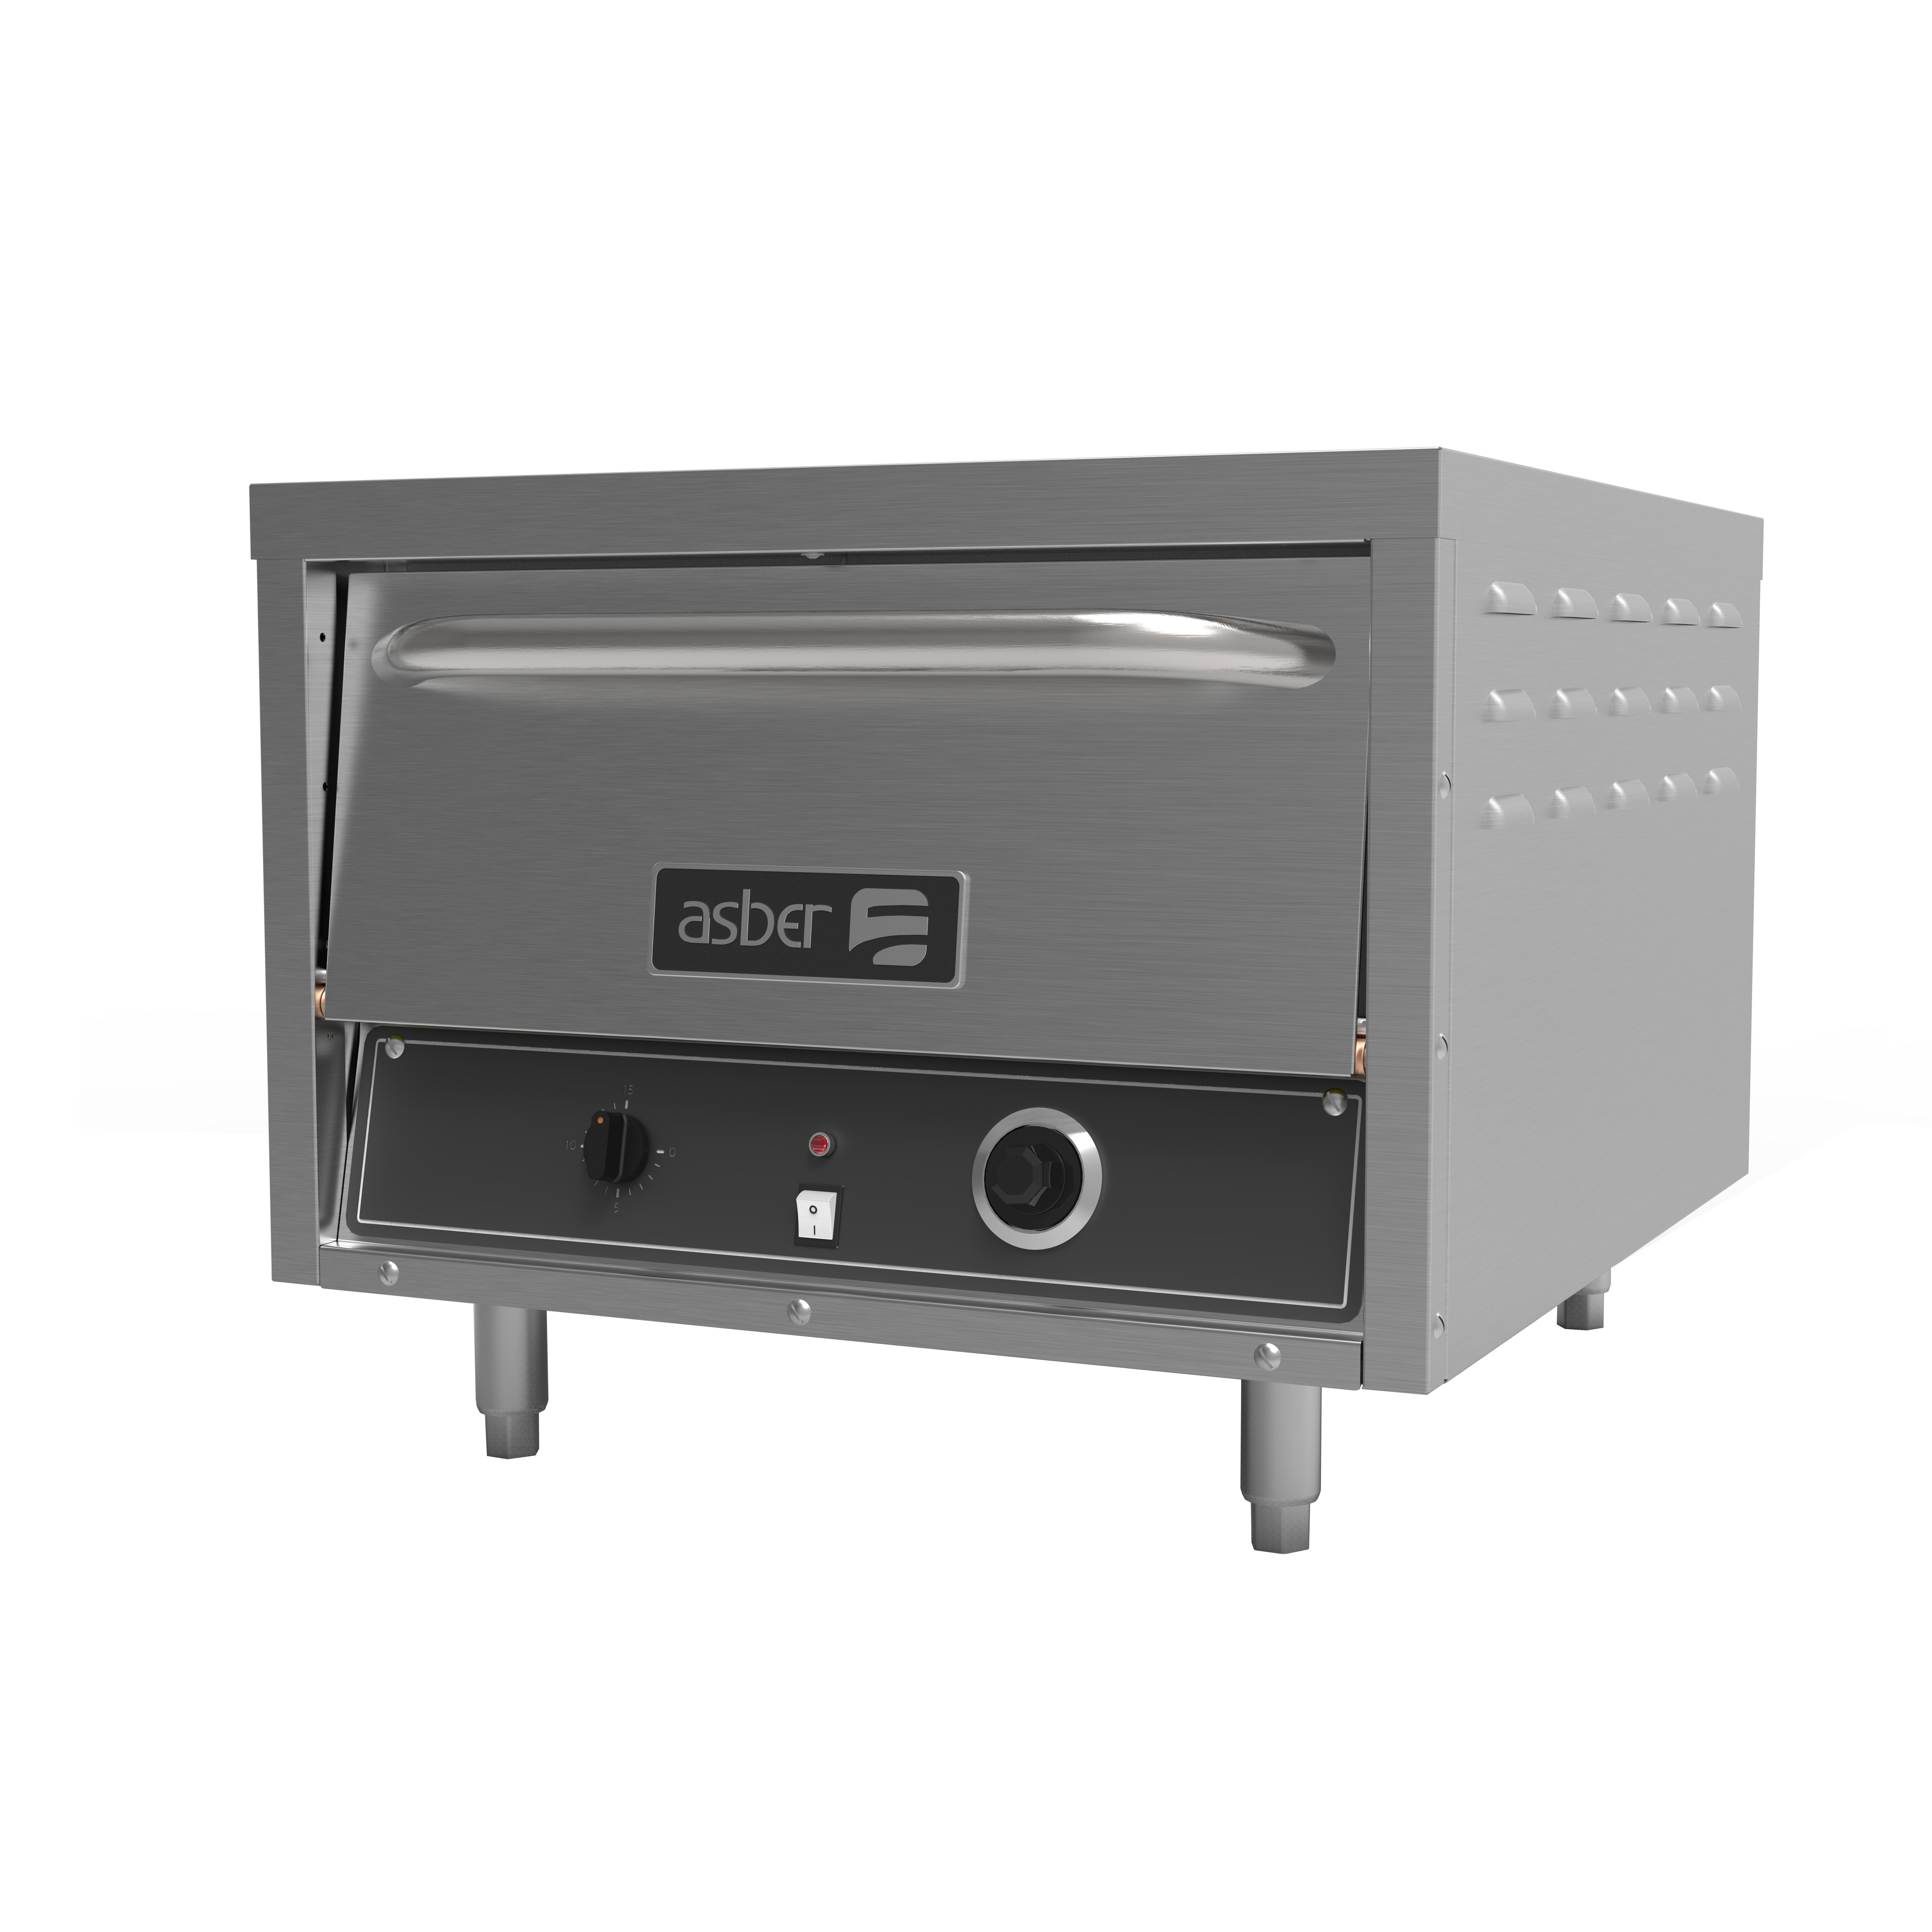 Asber AEPO E 26 pizza bake oven, countertop, electric